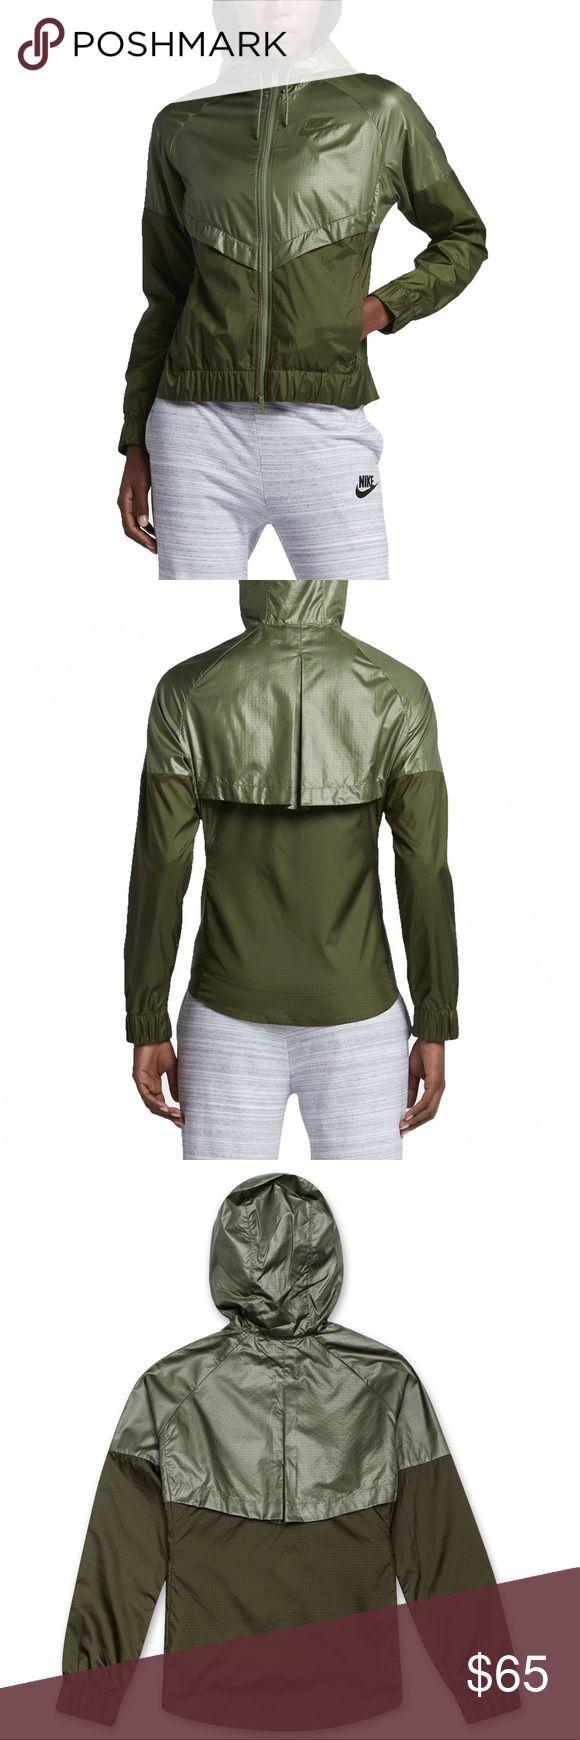 Women's Nike Windrunner Jacket Legion/Palm Green New Nike Jackets & Coats